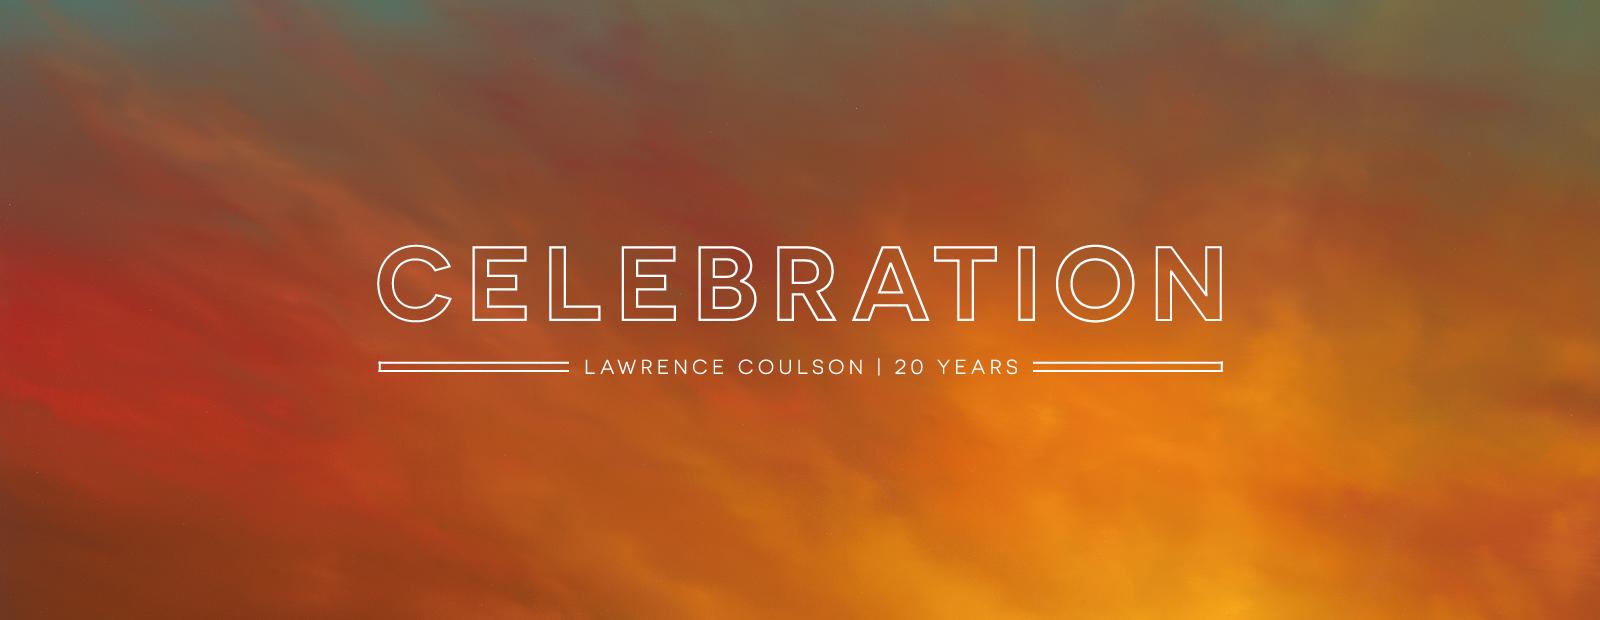 Lawrence Coulson Celebration   Artist Appearance   Castle